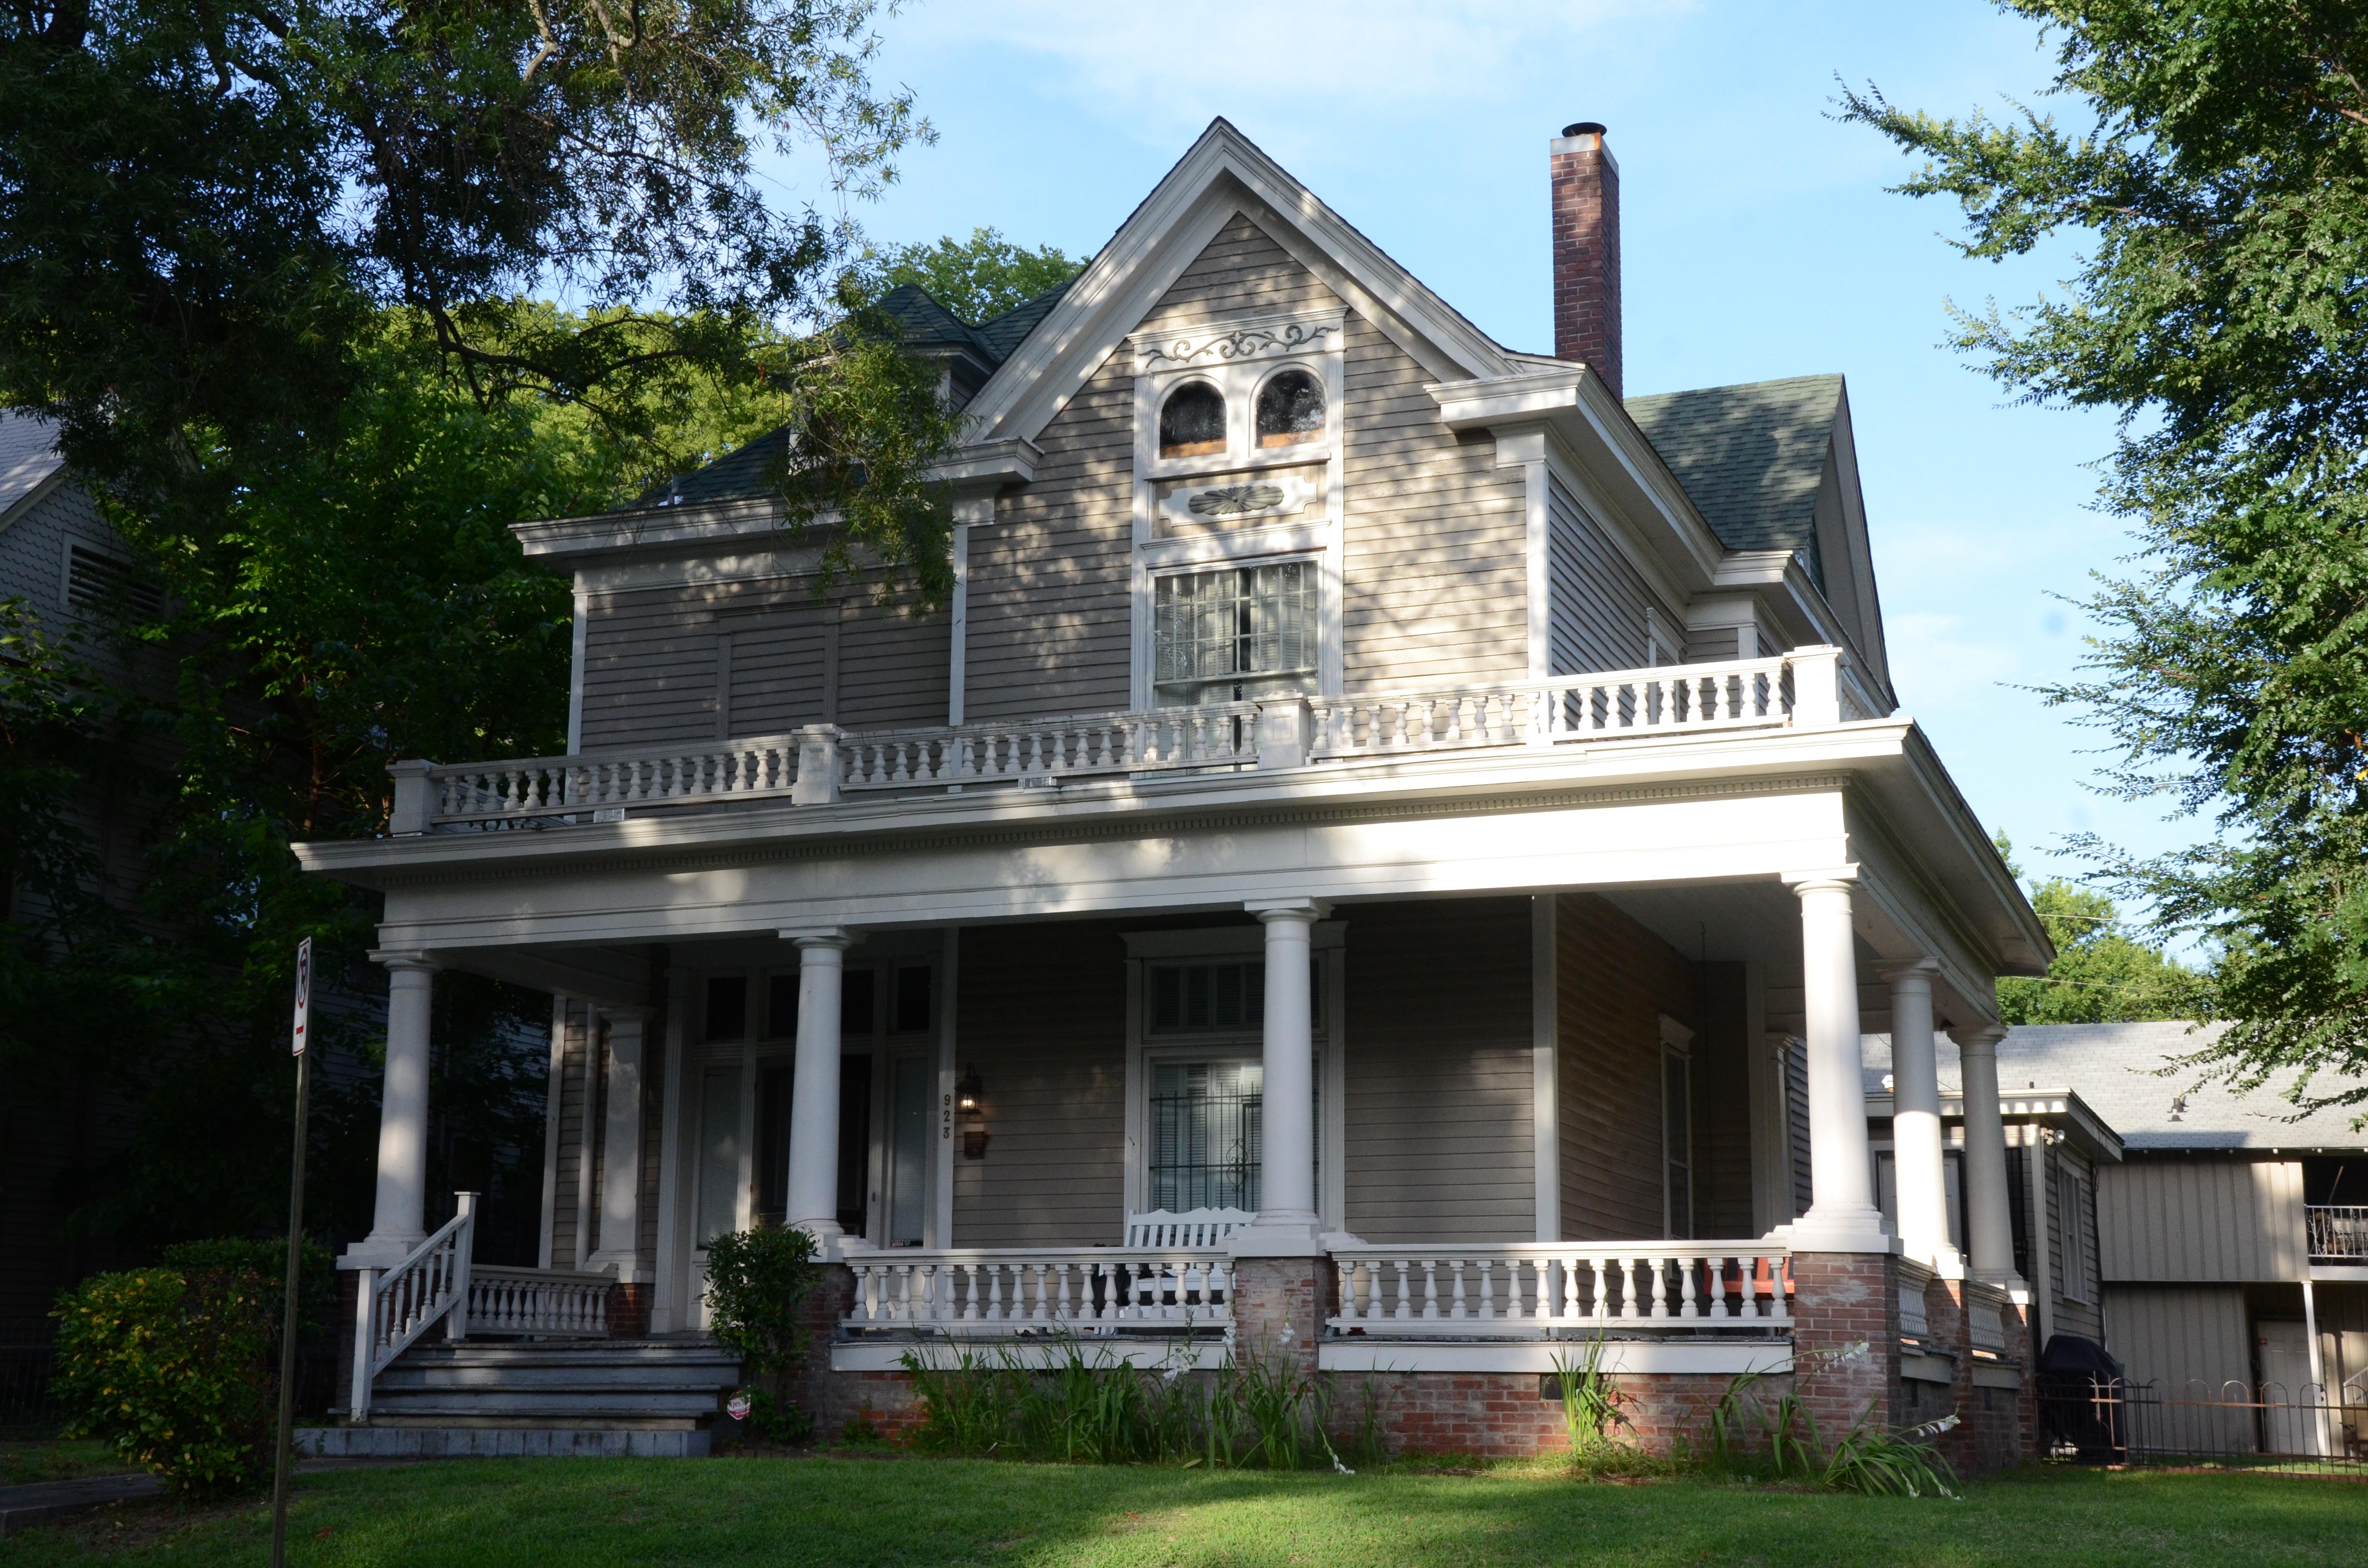 File:Thurston House, Little Rock, AR JPG - Wikipedia